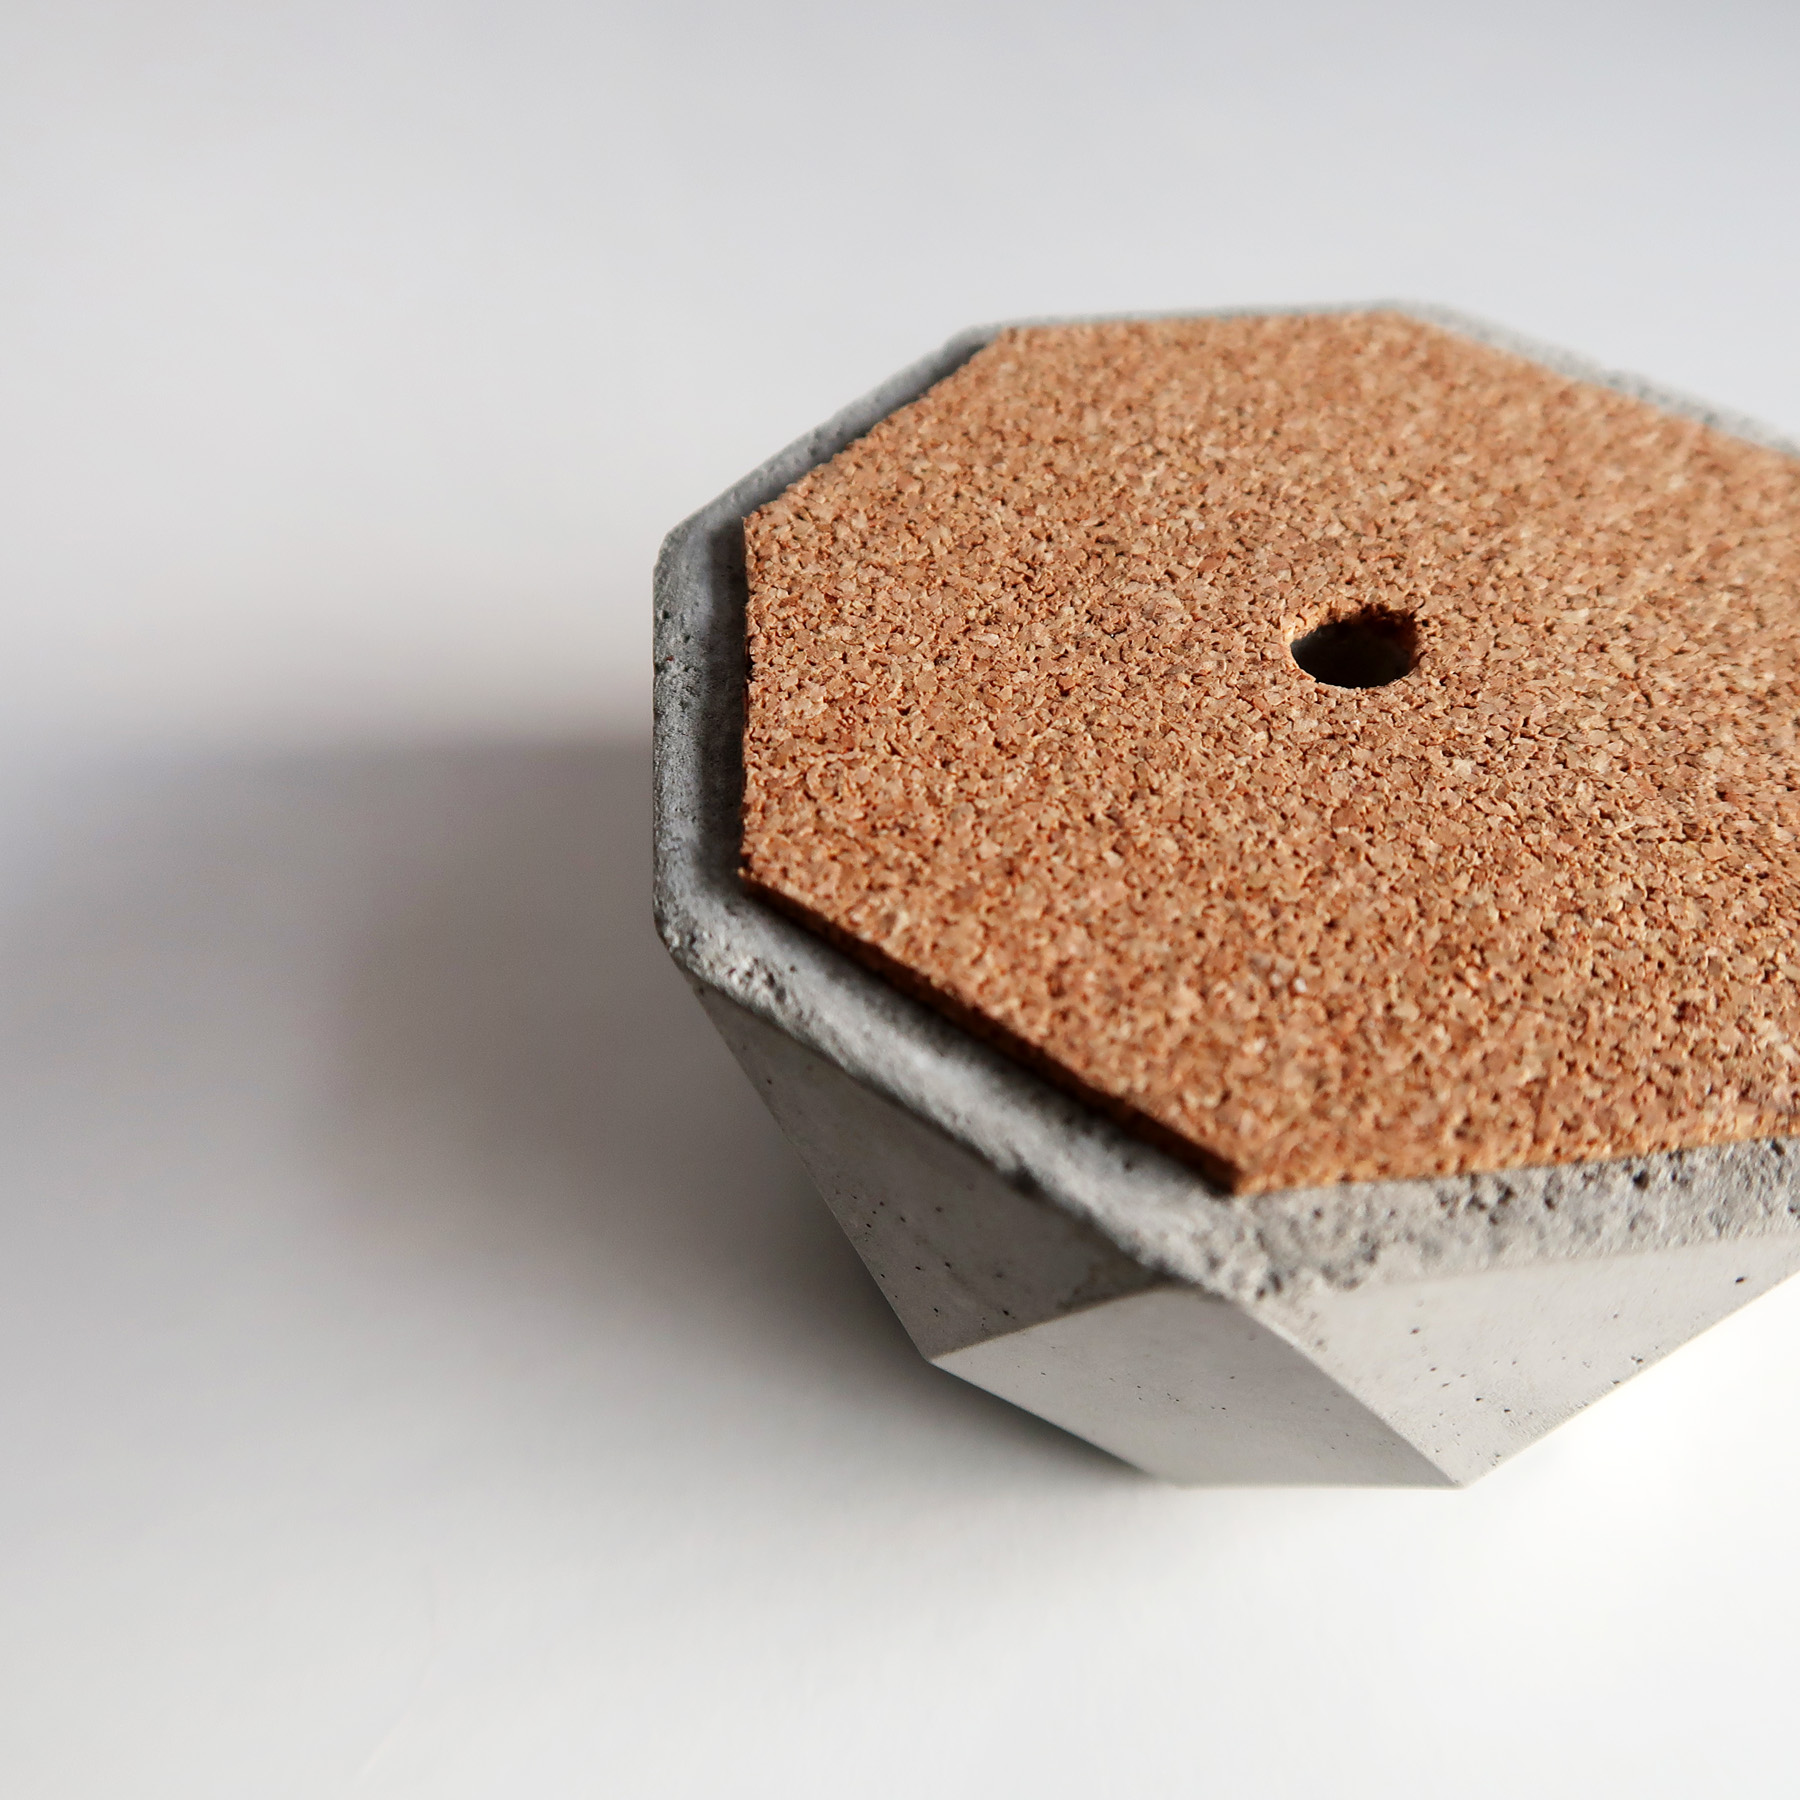 CENTENARY 百年紀念多用途水泥銅器擺飾 - 細節